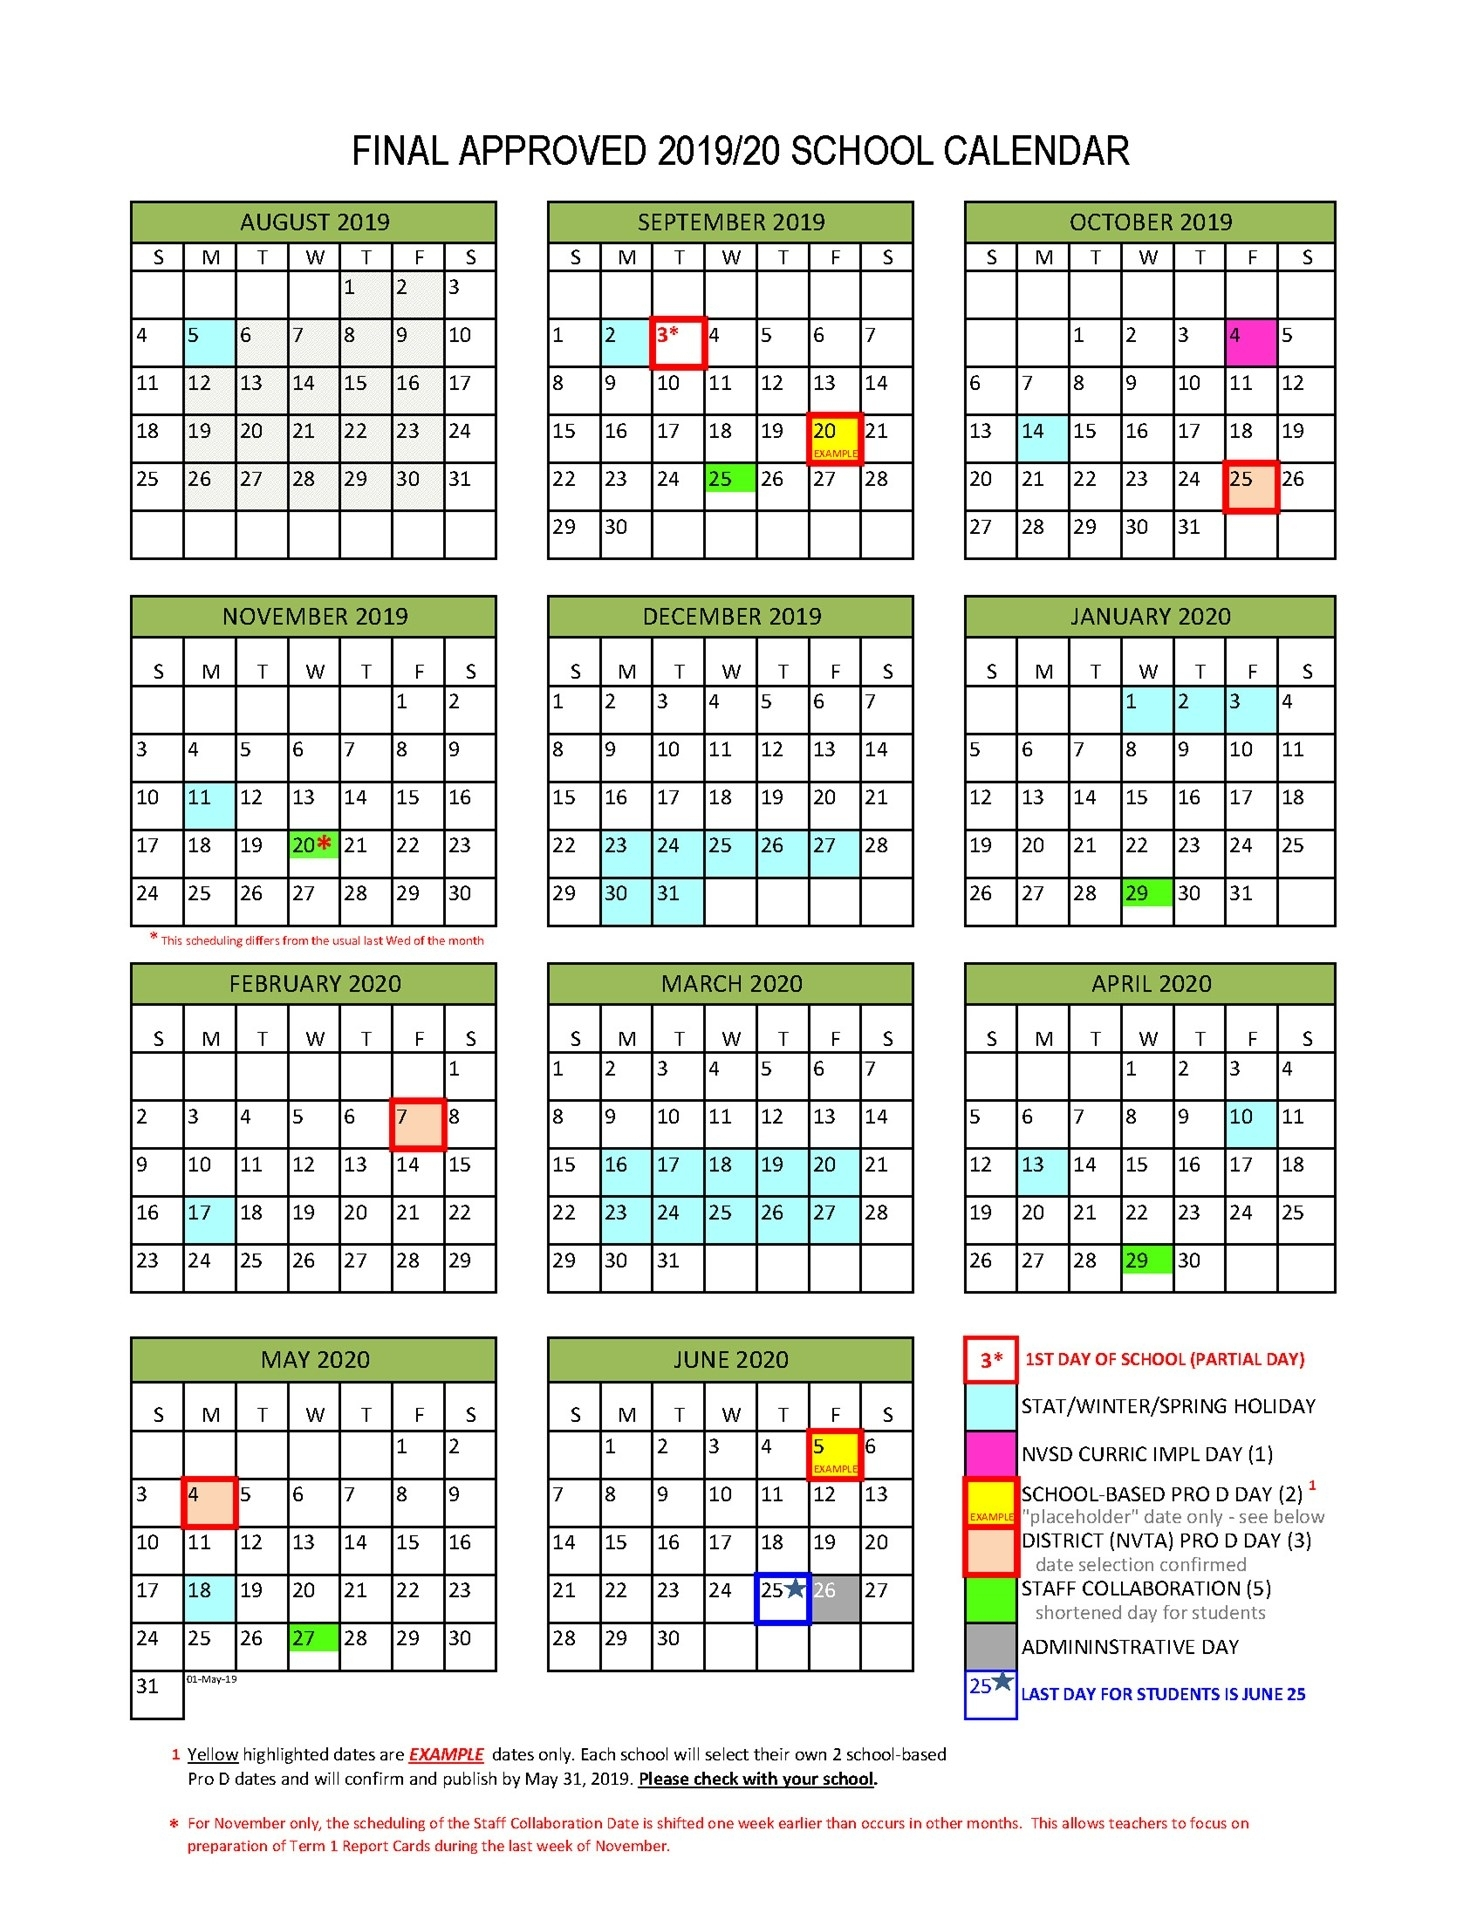 District Calendar - North Vancouver School District regarding Calendar 2019-2020 Important Dates